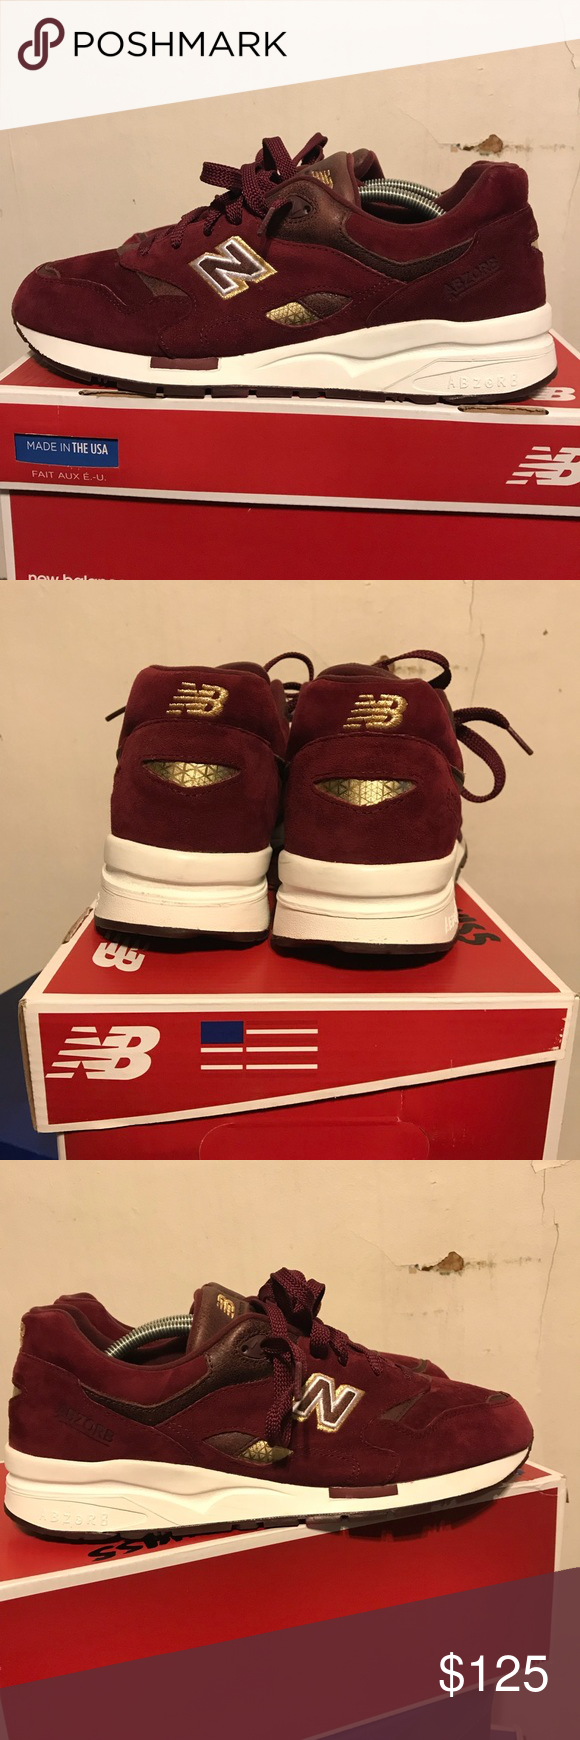 "New Balance 1600 x Ubiq ""Crown Jewel"" Condition 9-10 New Balance Shoes  Sneakers 6bfab67385"